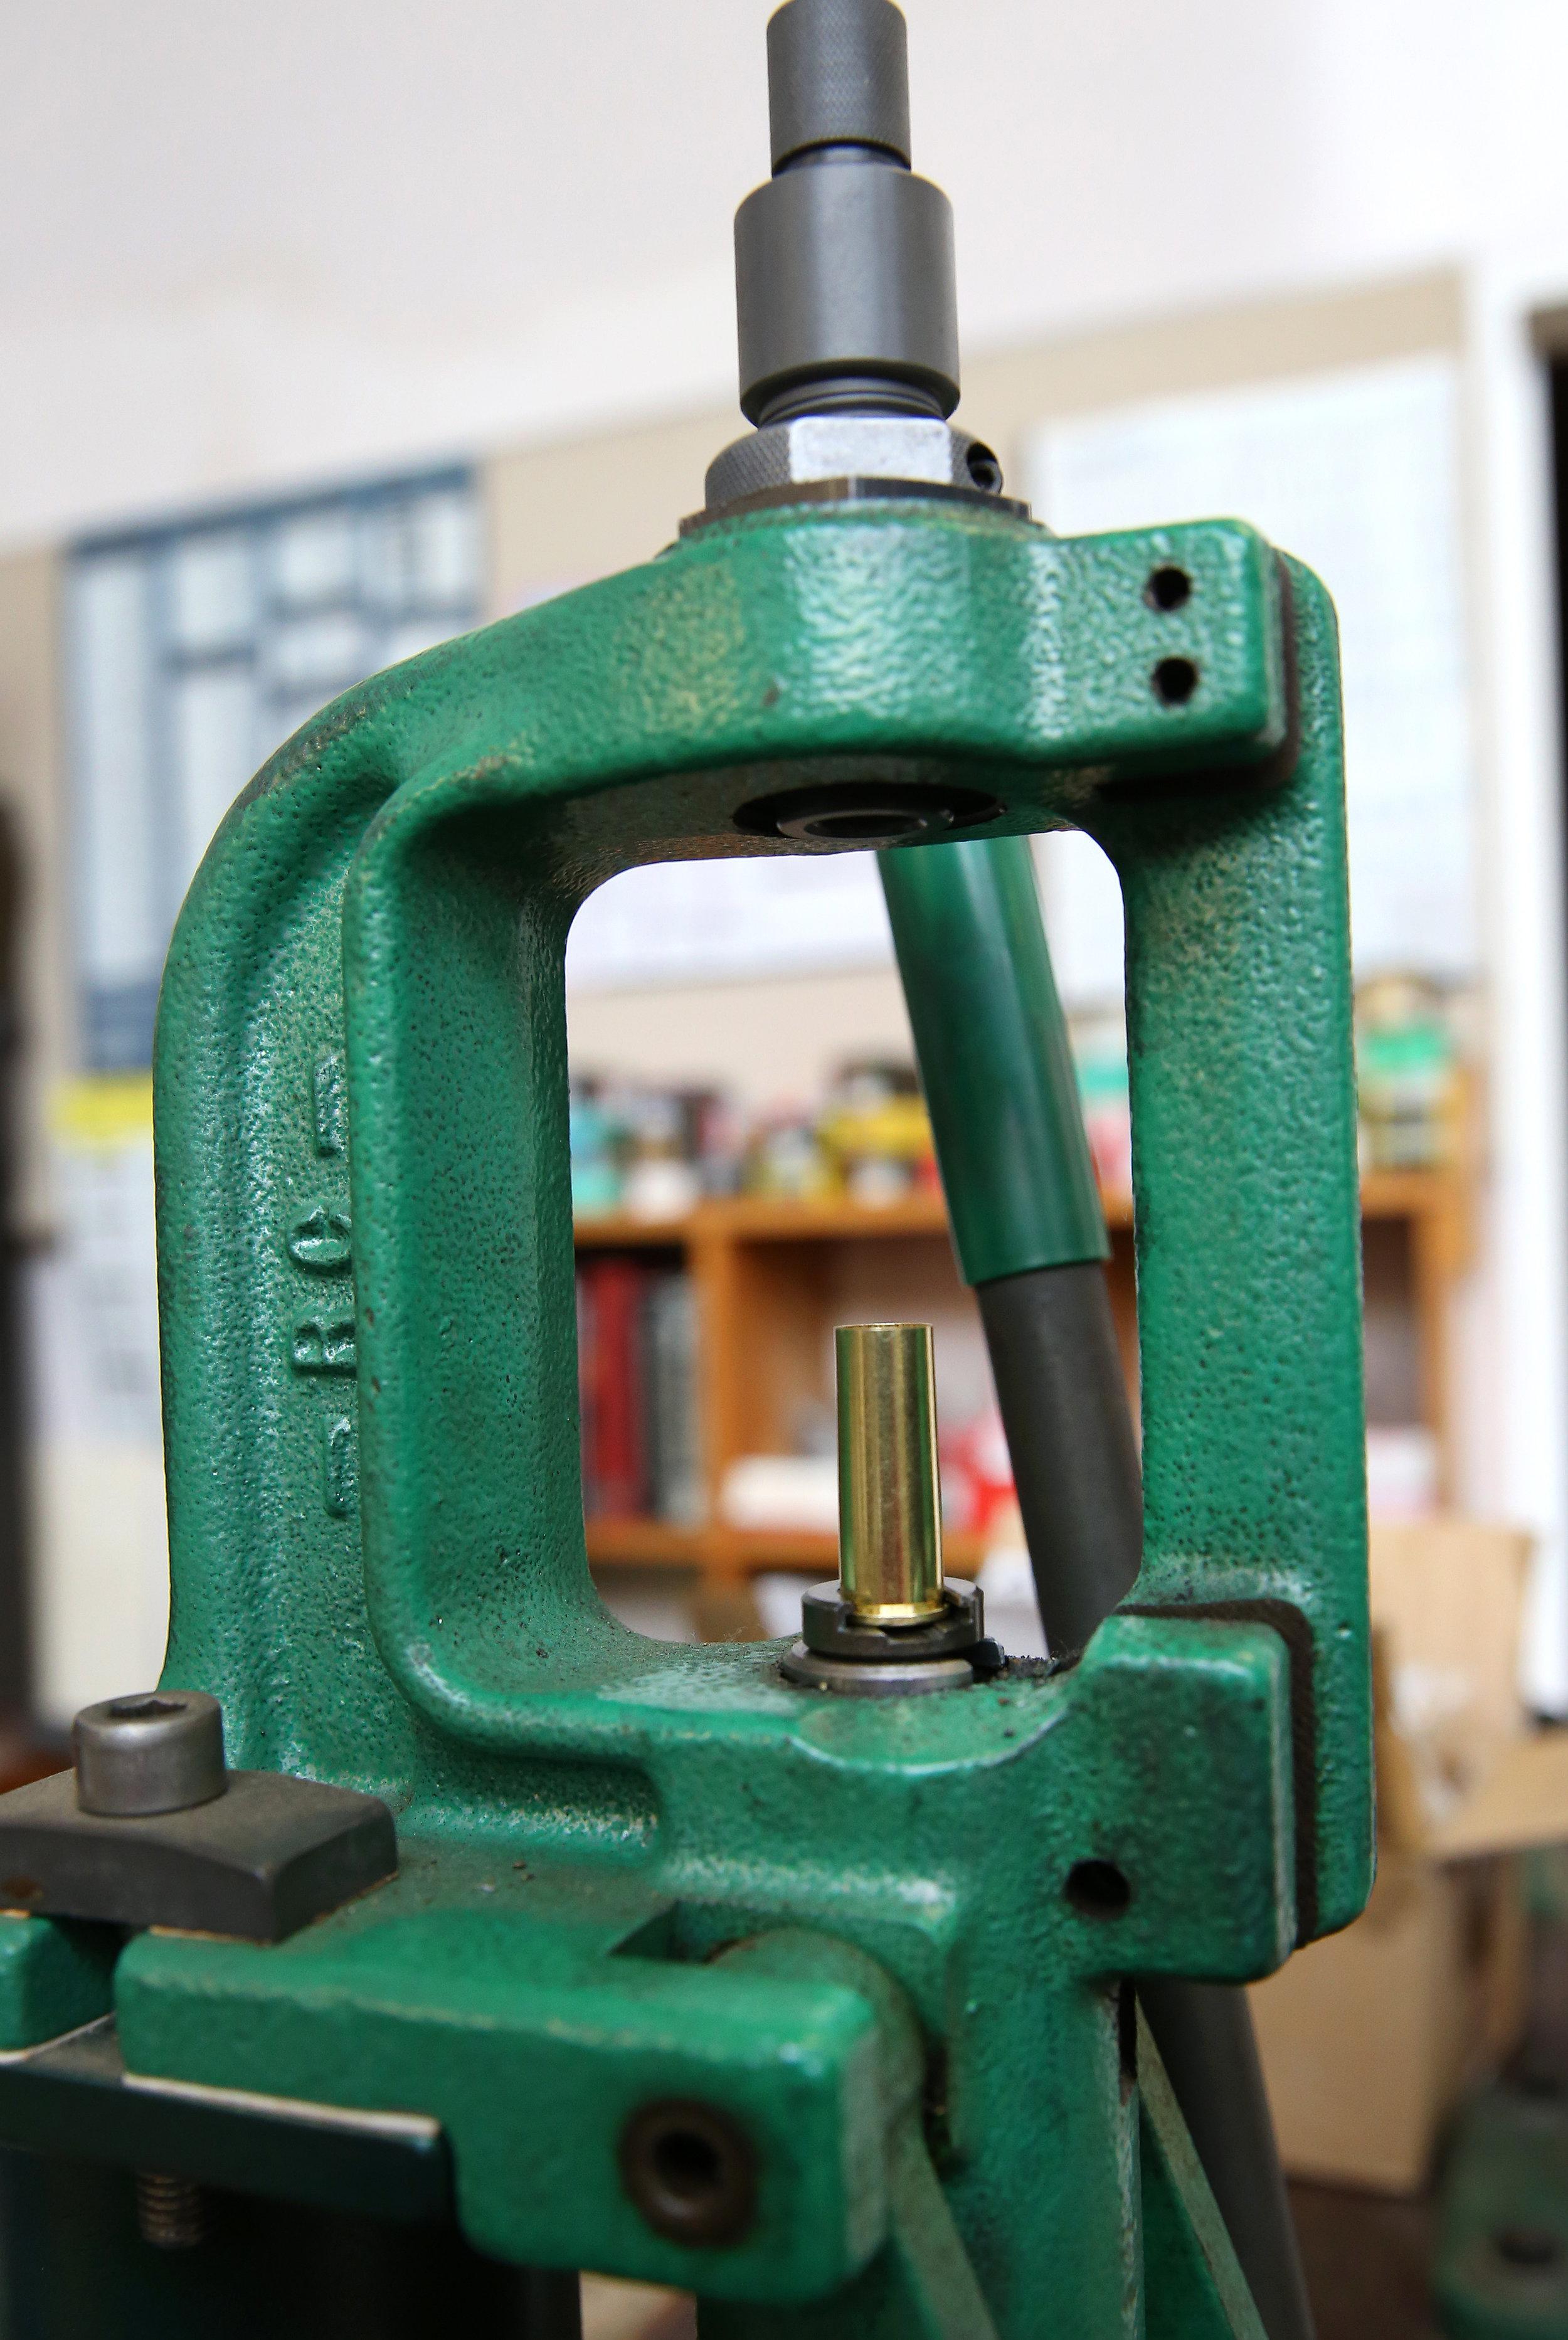 gunsmith 08 CrimpingCableCuttingBlanks1.jpg